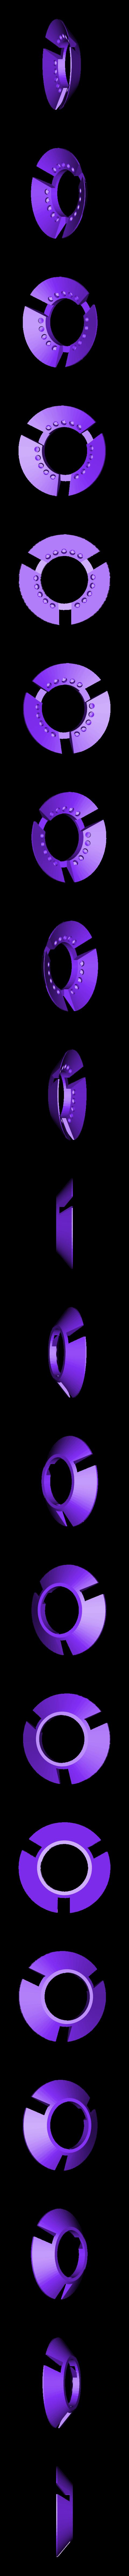 Part6-1.STL Download STL file Tracer pulse bomb. • 3D printable design, Cosple